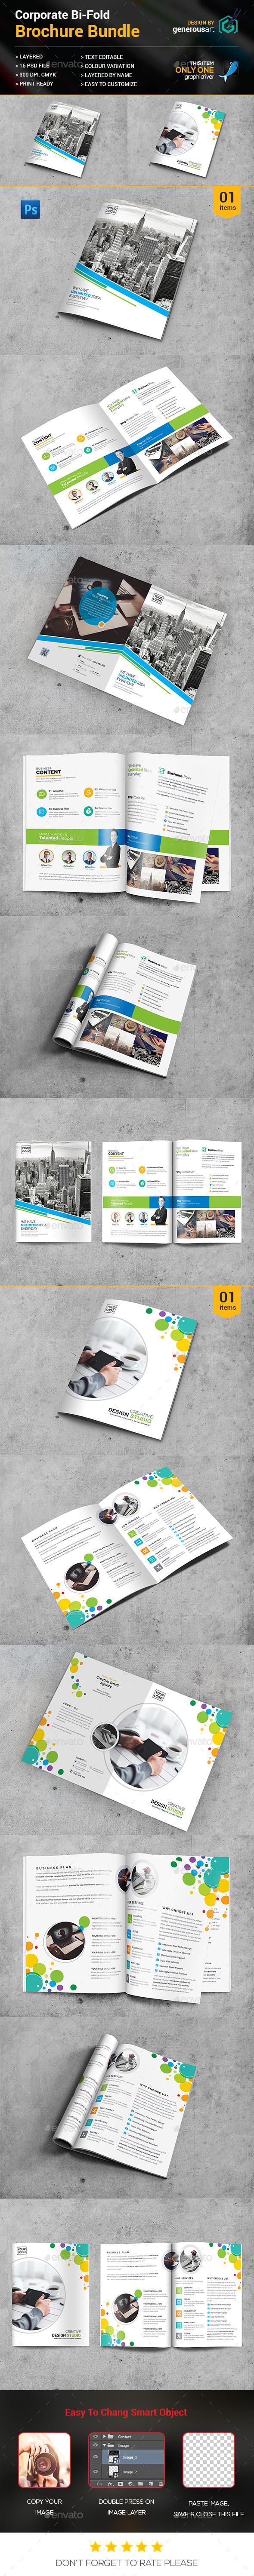 Bi-fold Brochure Bundle_2 in 1 - Brochures Print Templates